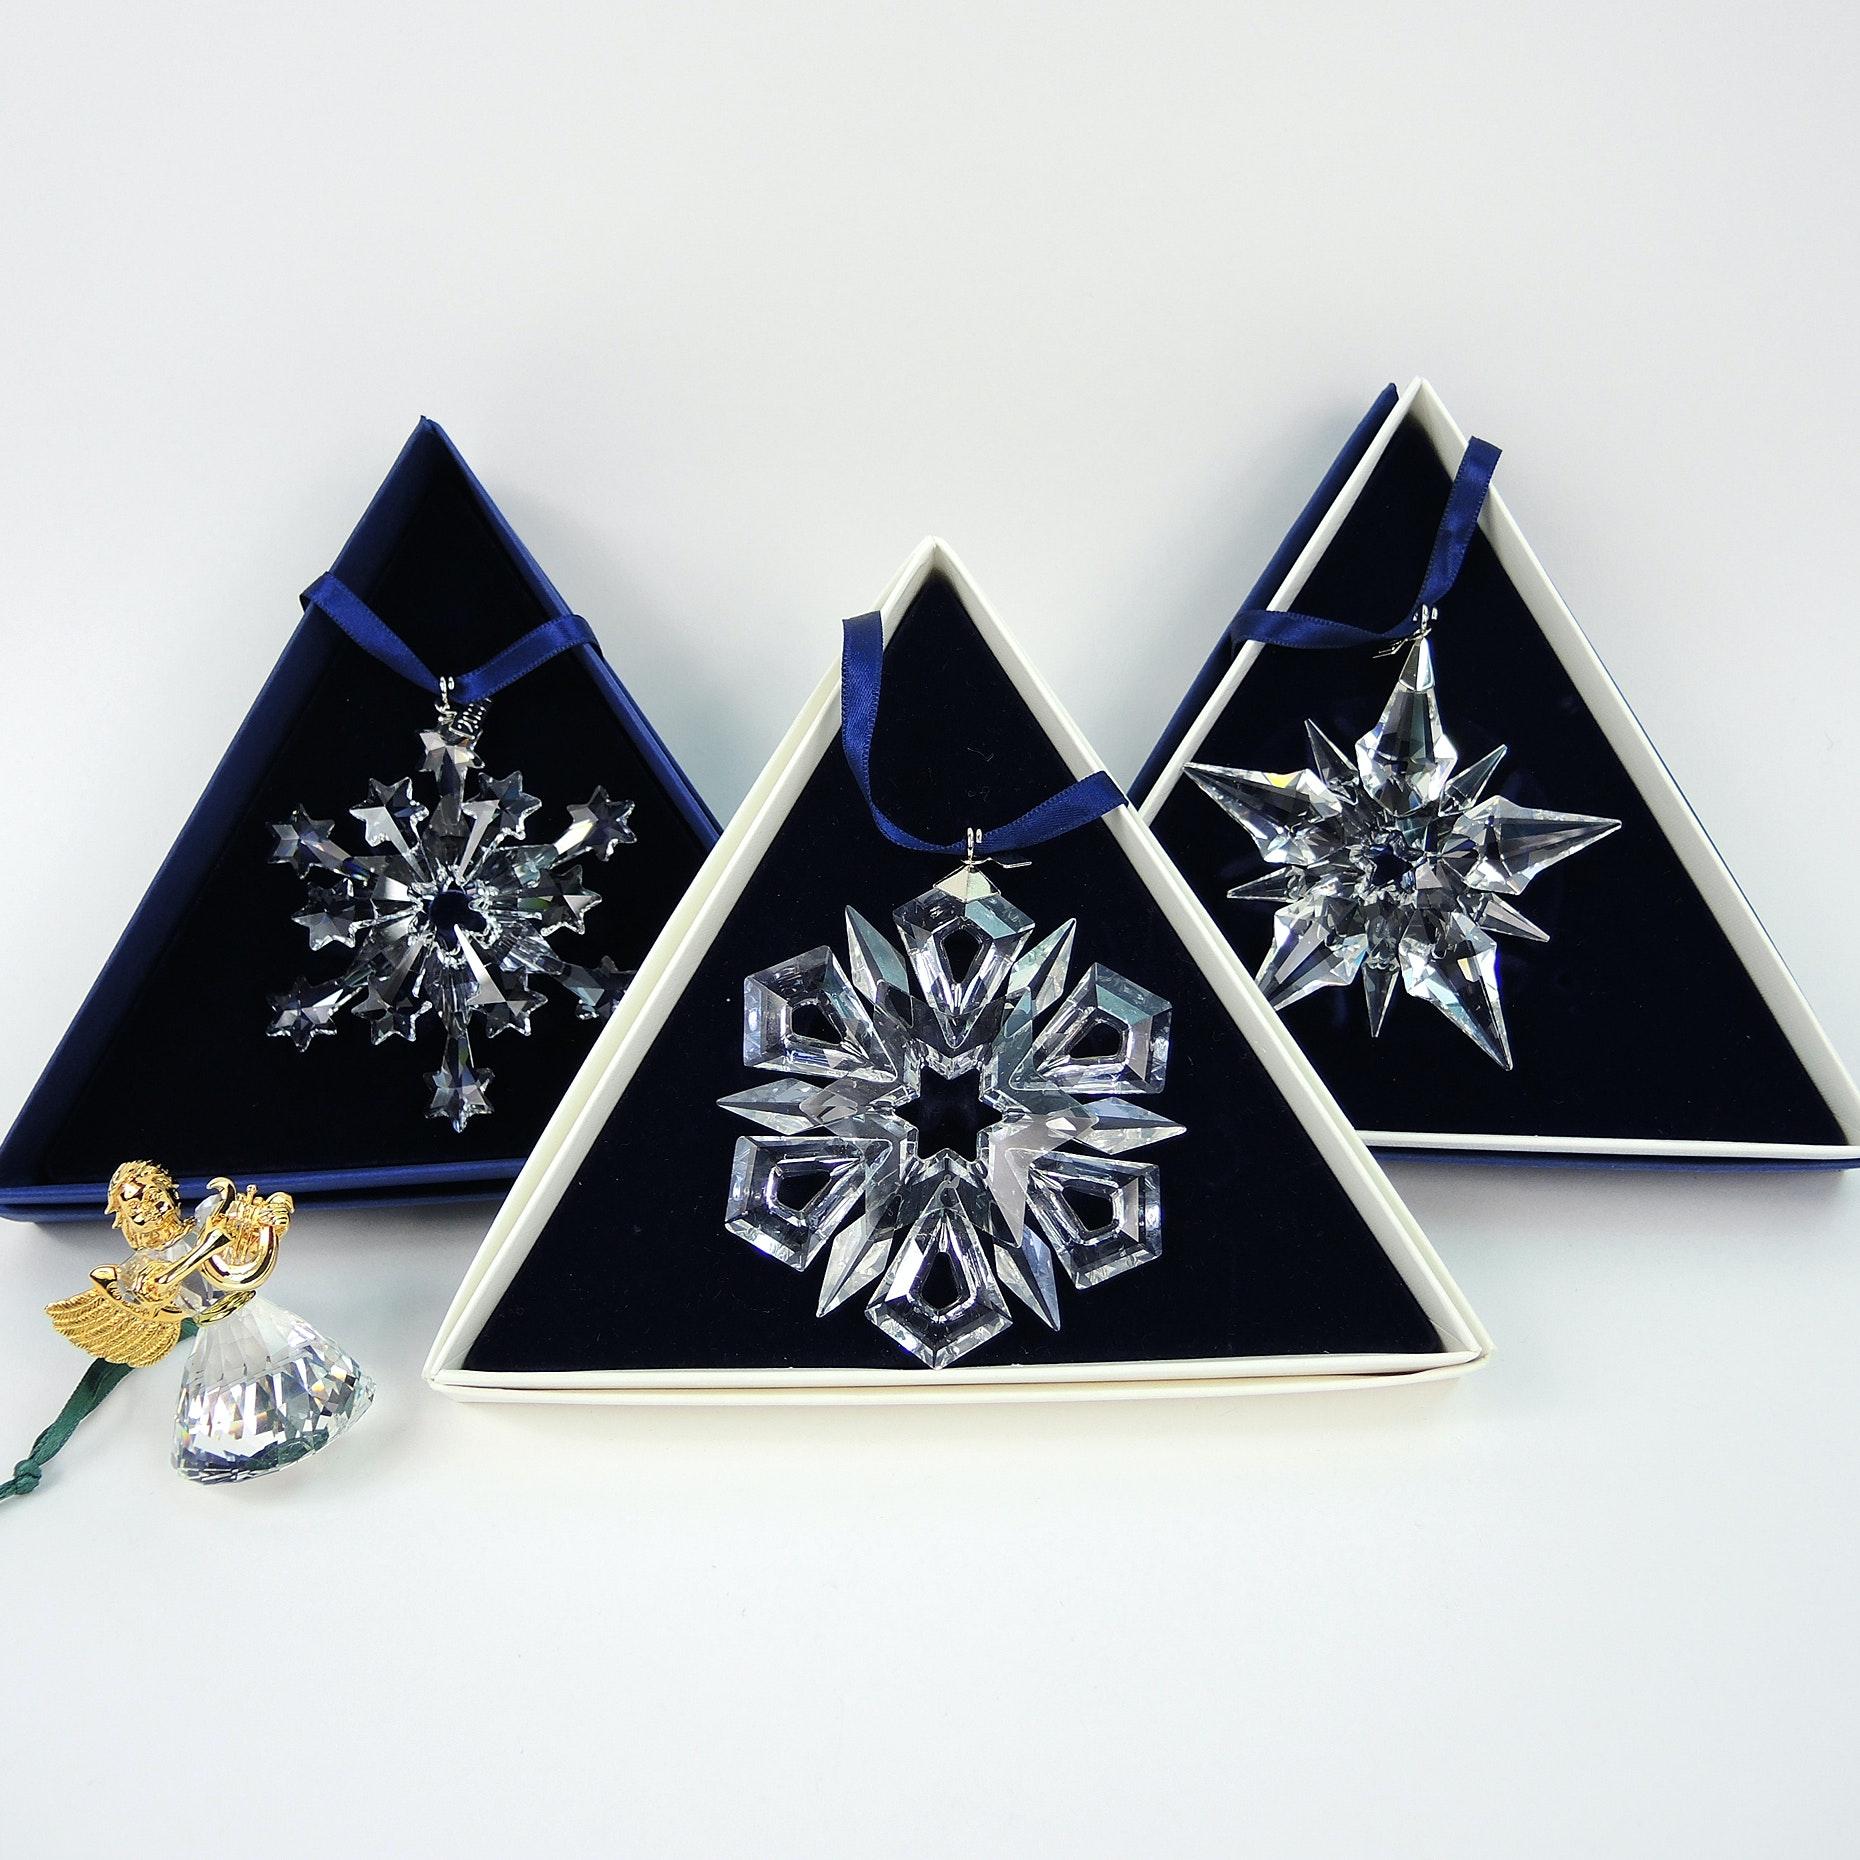 Swarovski Crystal Snowflakes Christmas Ornaments